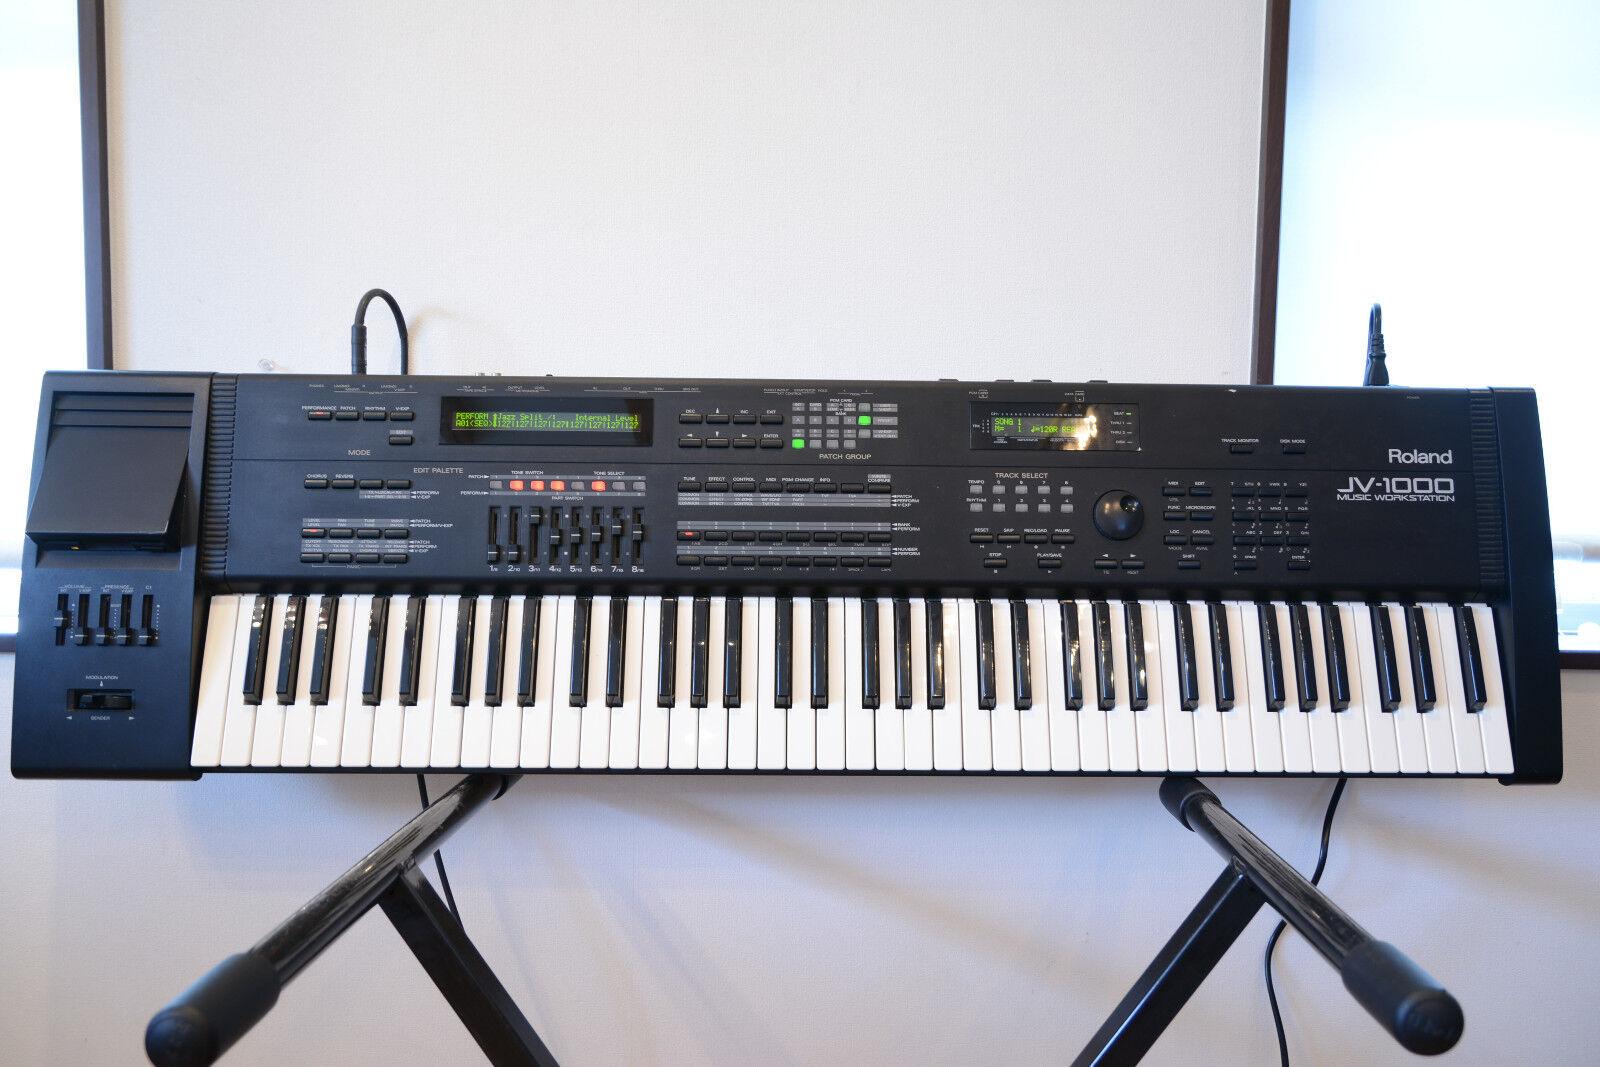 roland jv 1000 76key music workstation keyboard controller midi synthesizer ebay. Black Bedroom Furniture Sets. Home Design Ideas